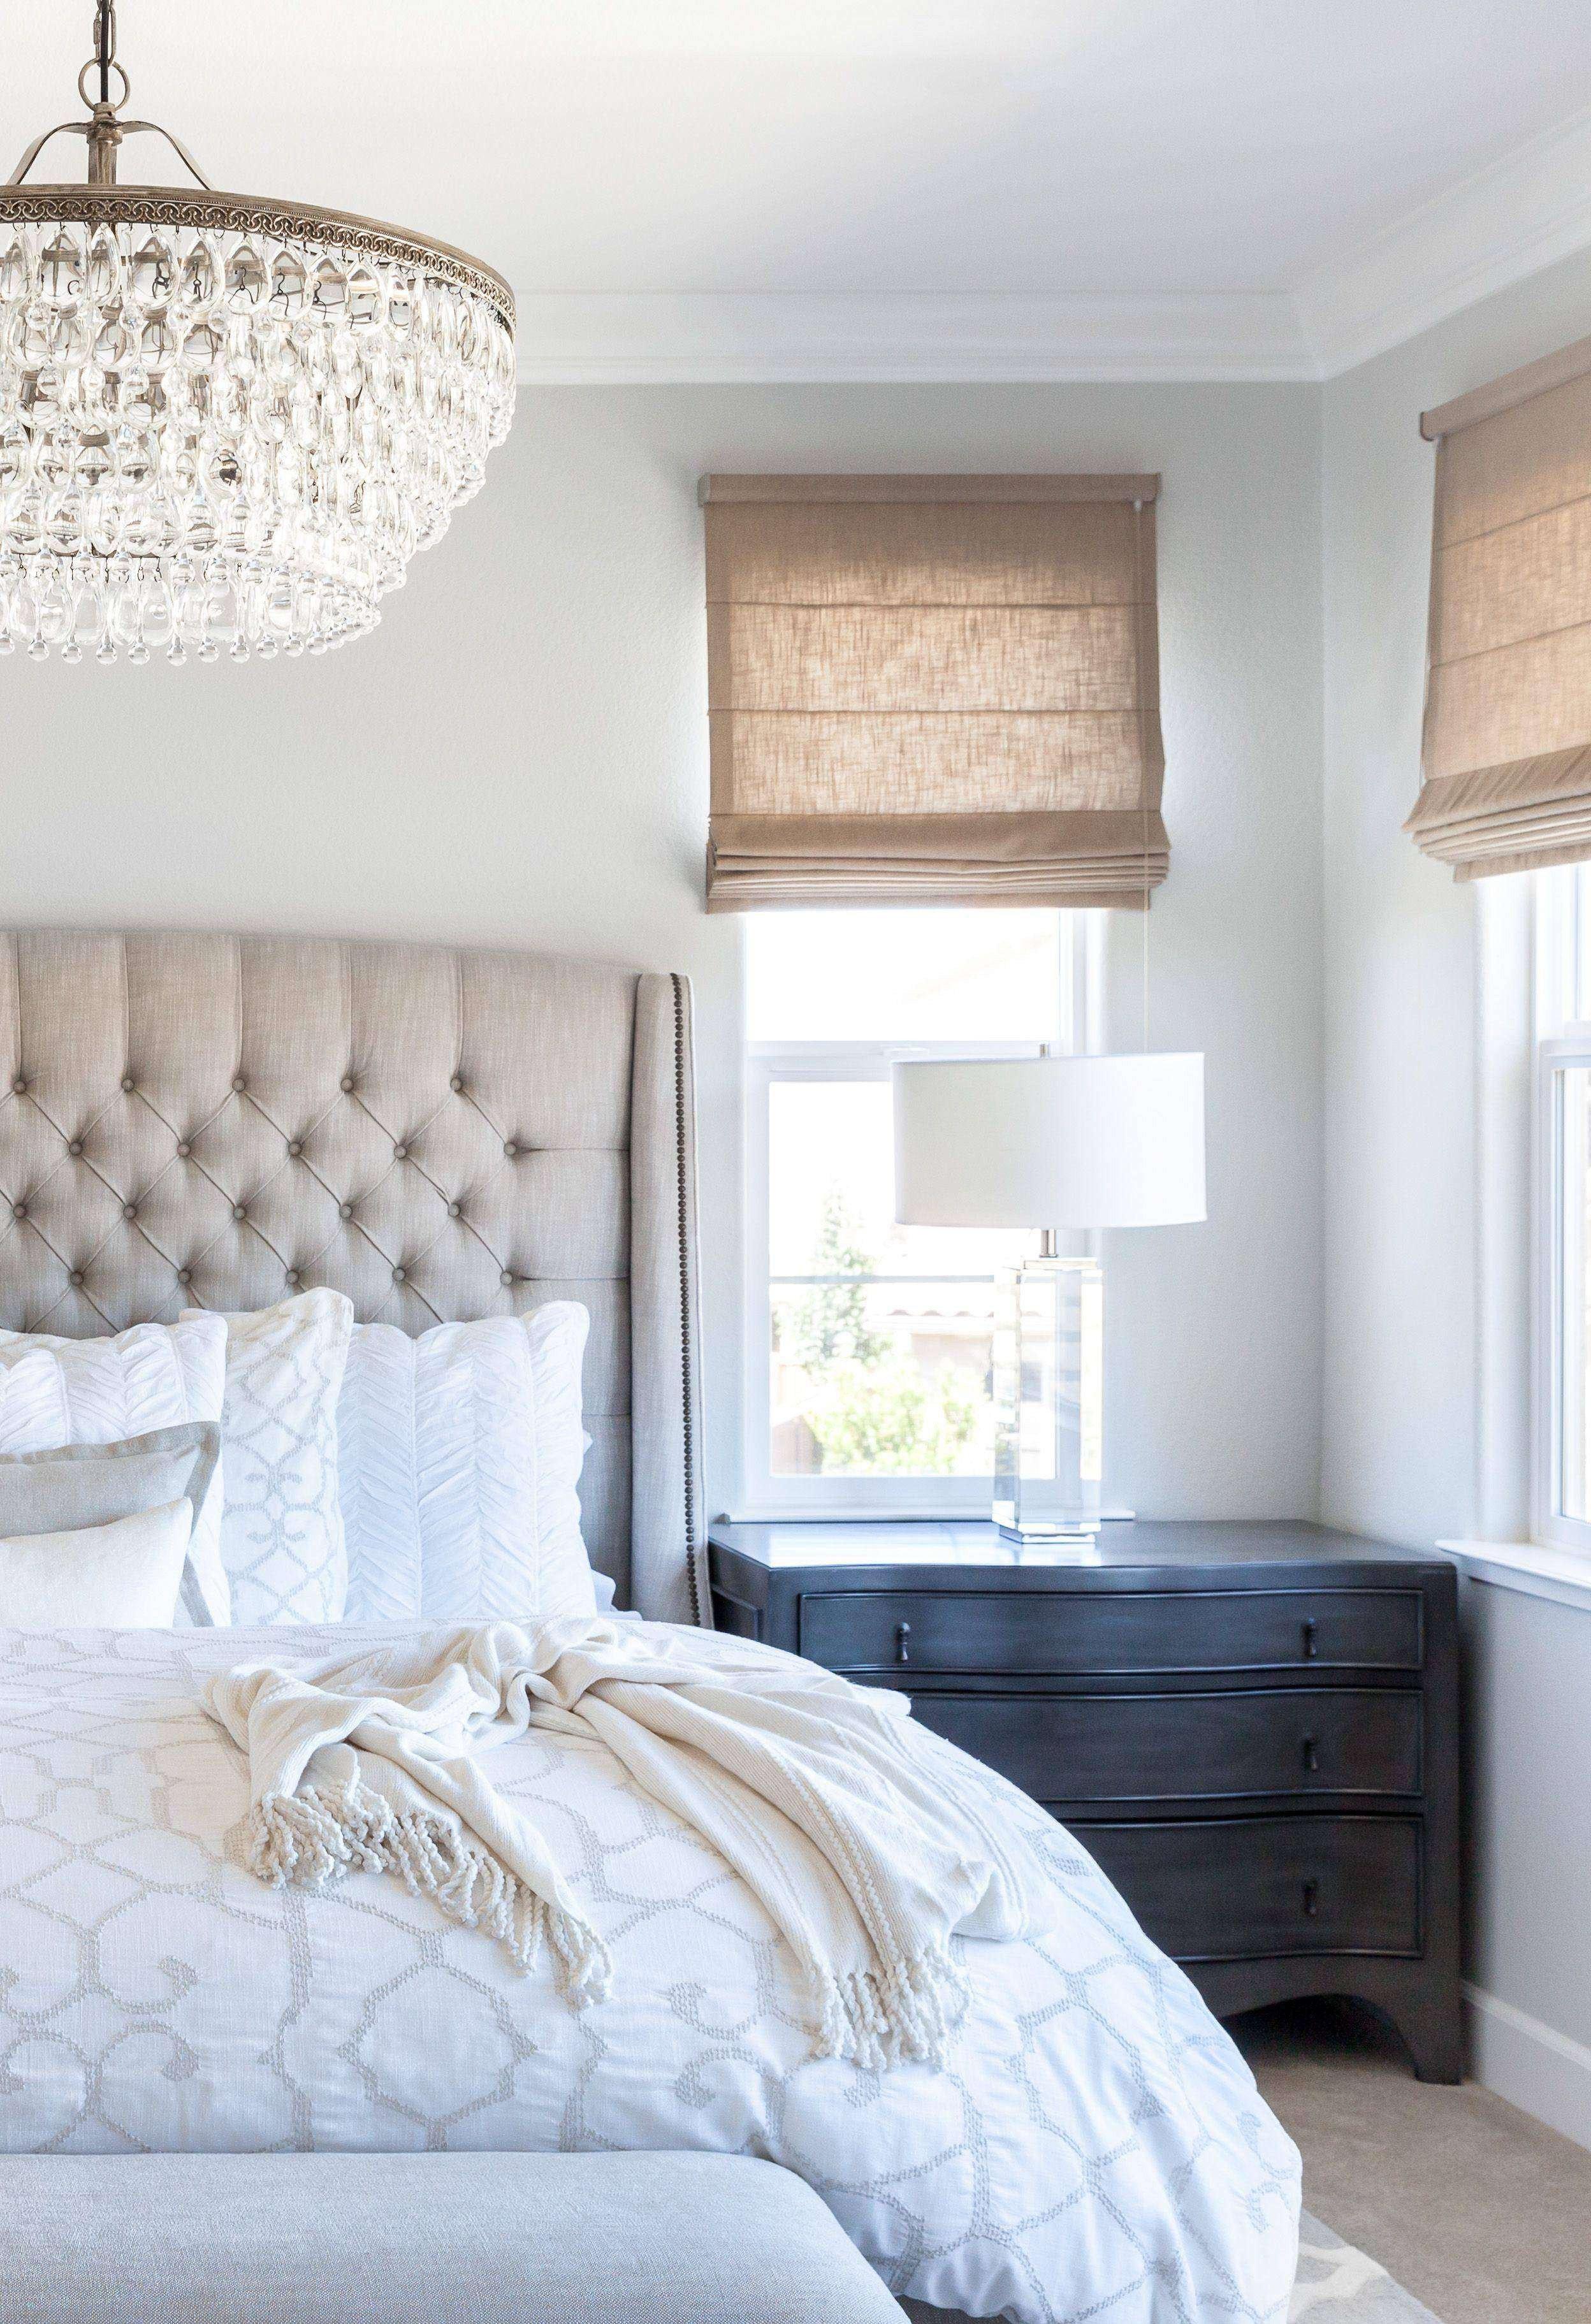 White and Gold Bedroom Ideas Fresh 24 Fashionable Flower Vase for Bedroom